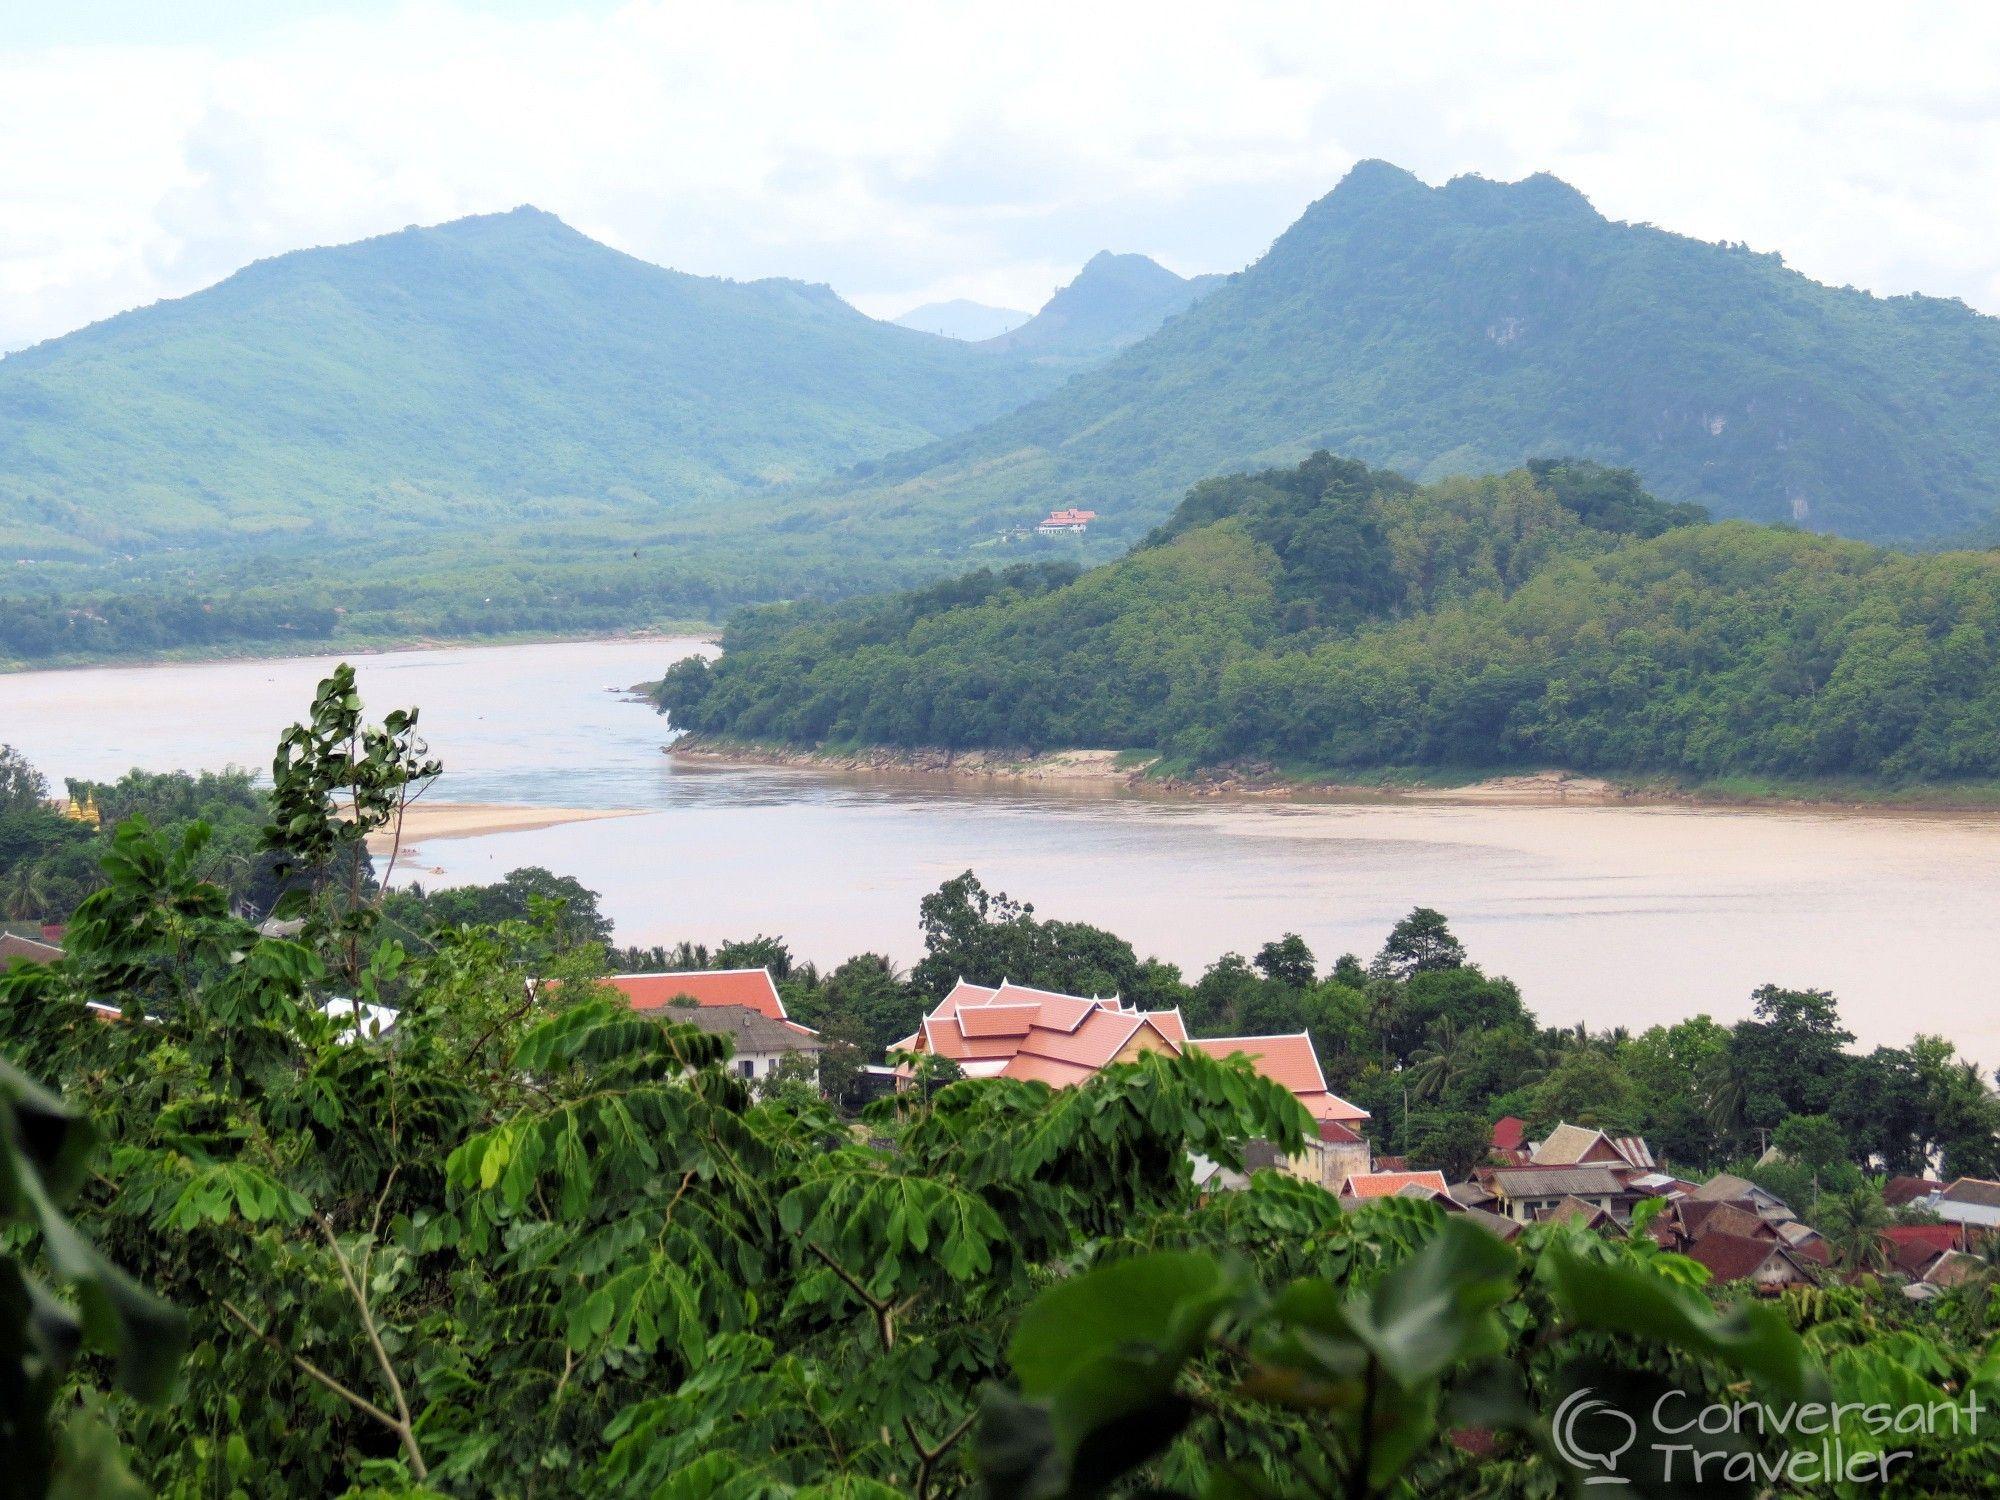 Luang Prabang and the Mekong from Mount Phousi